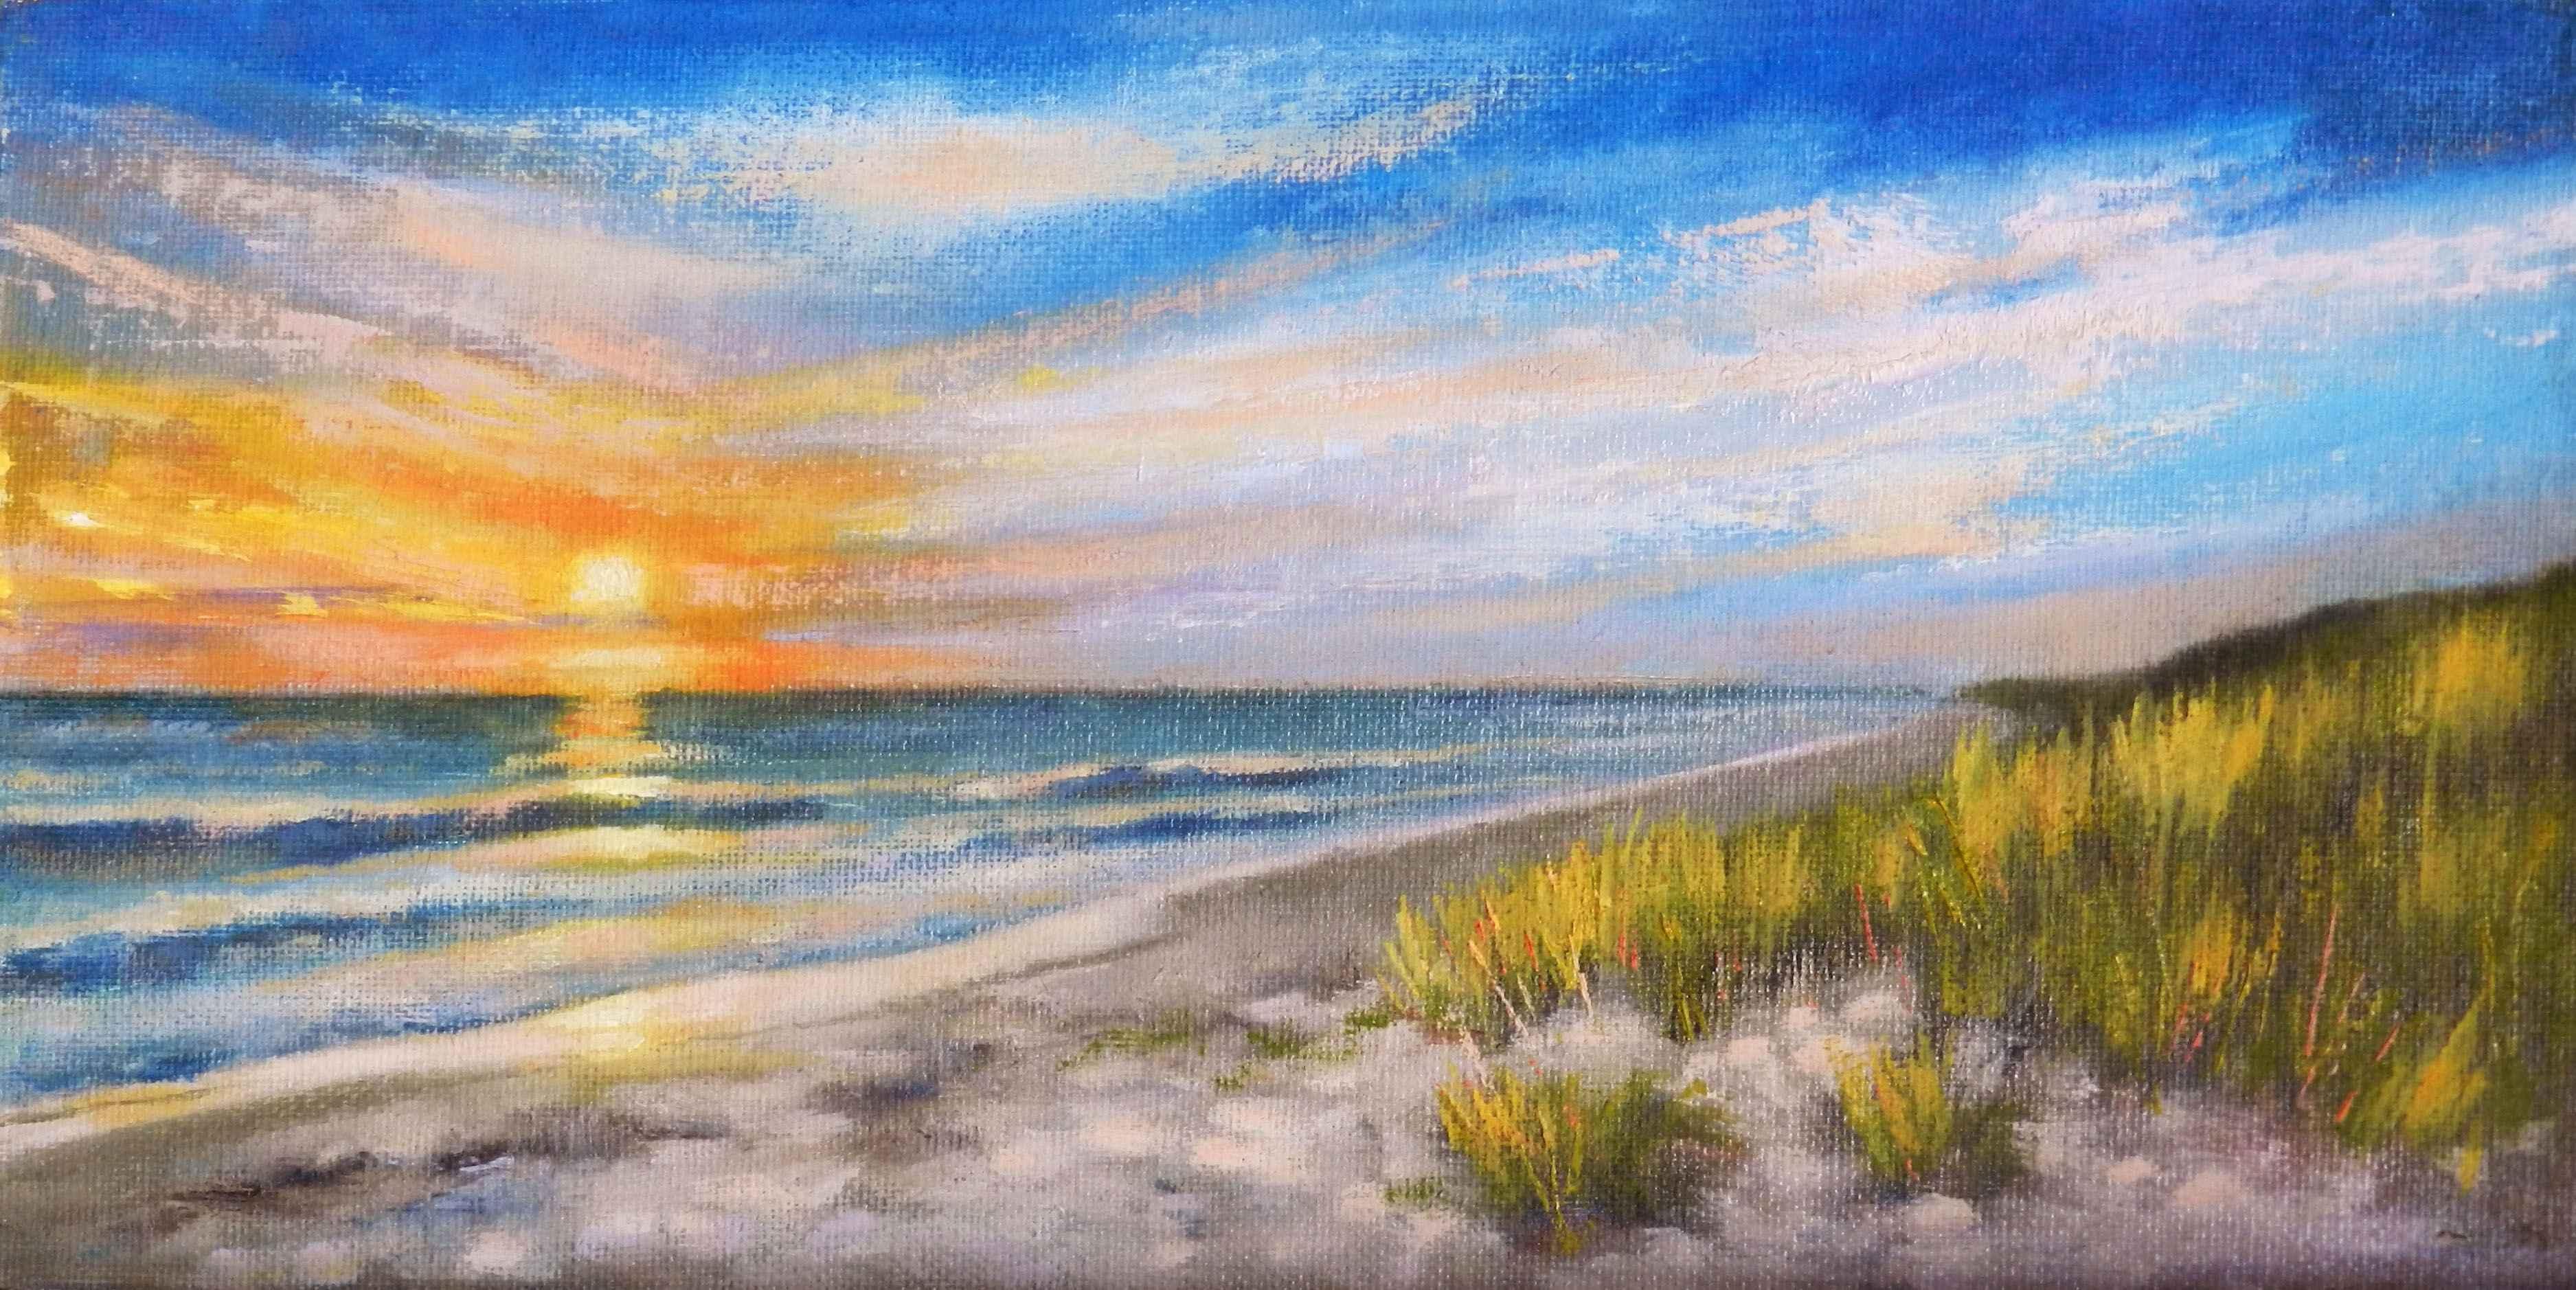 Sunset Beach by  Sharon McCann Daly - Masterpiece Online